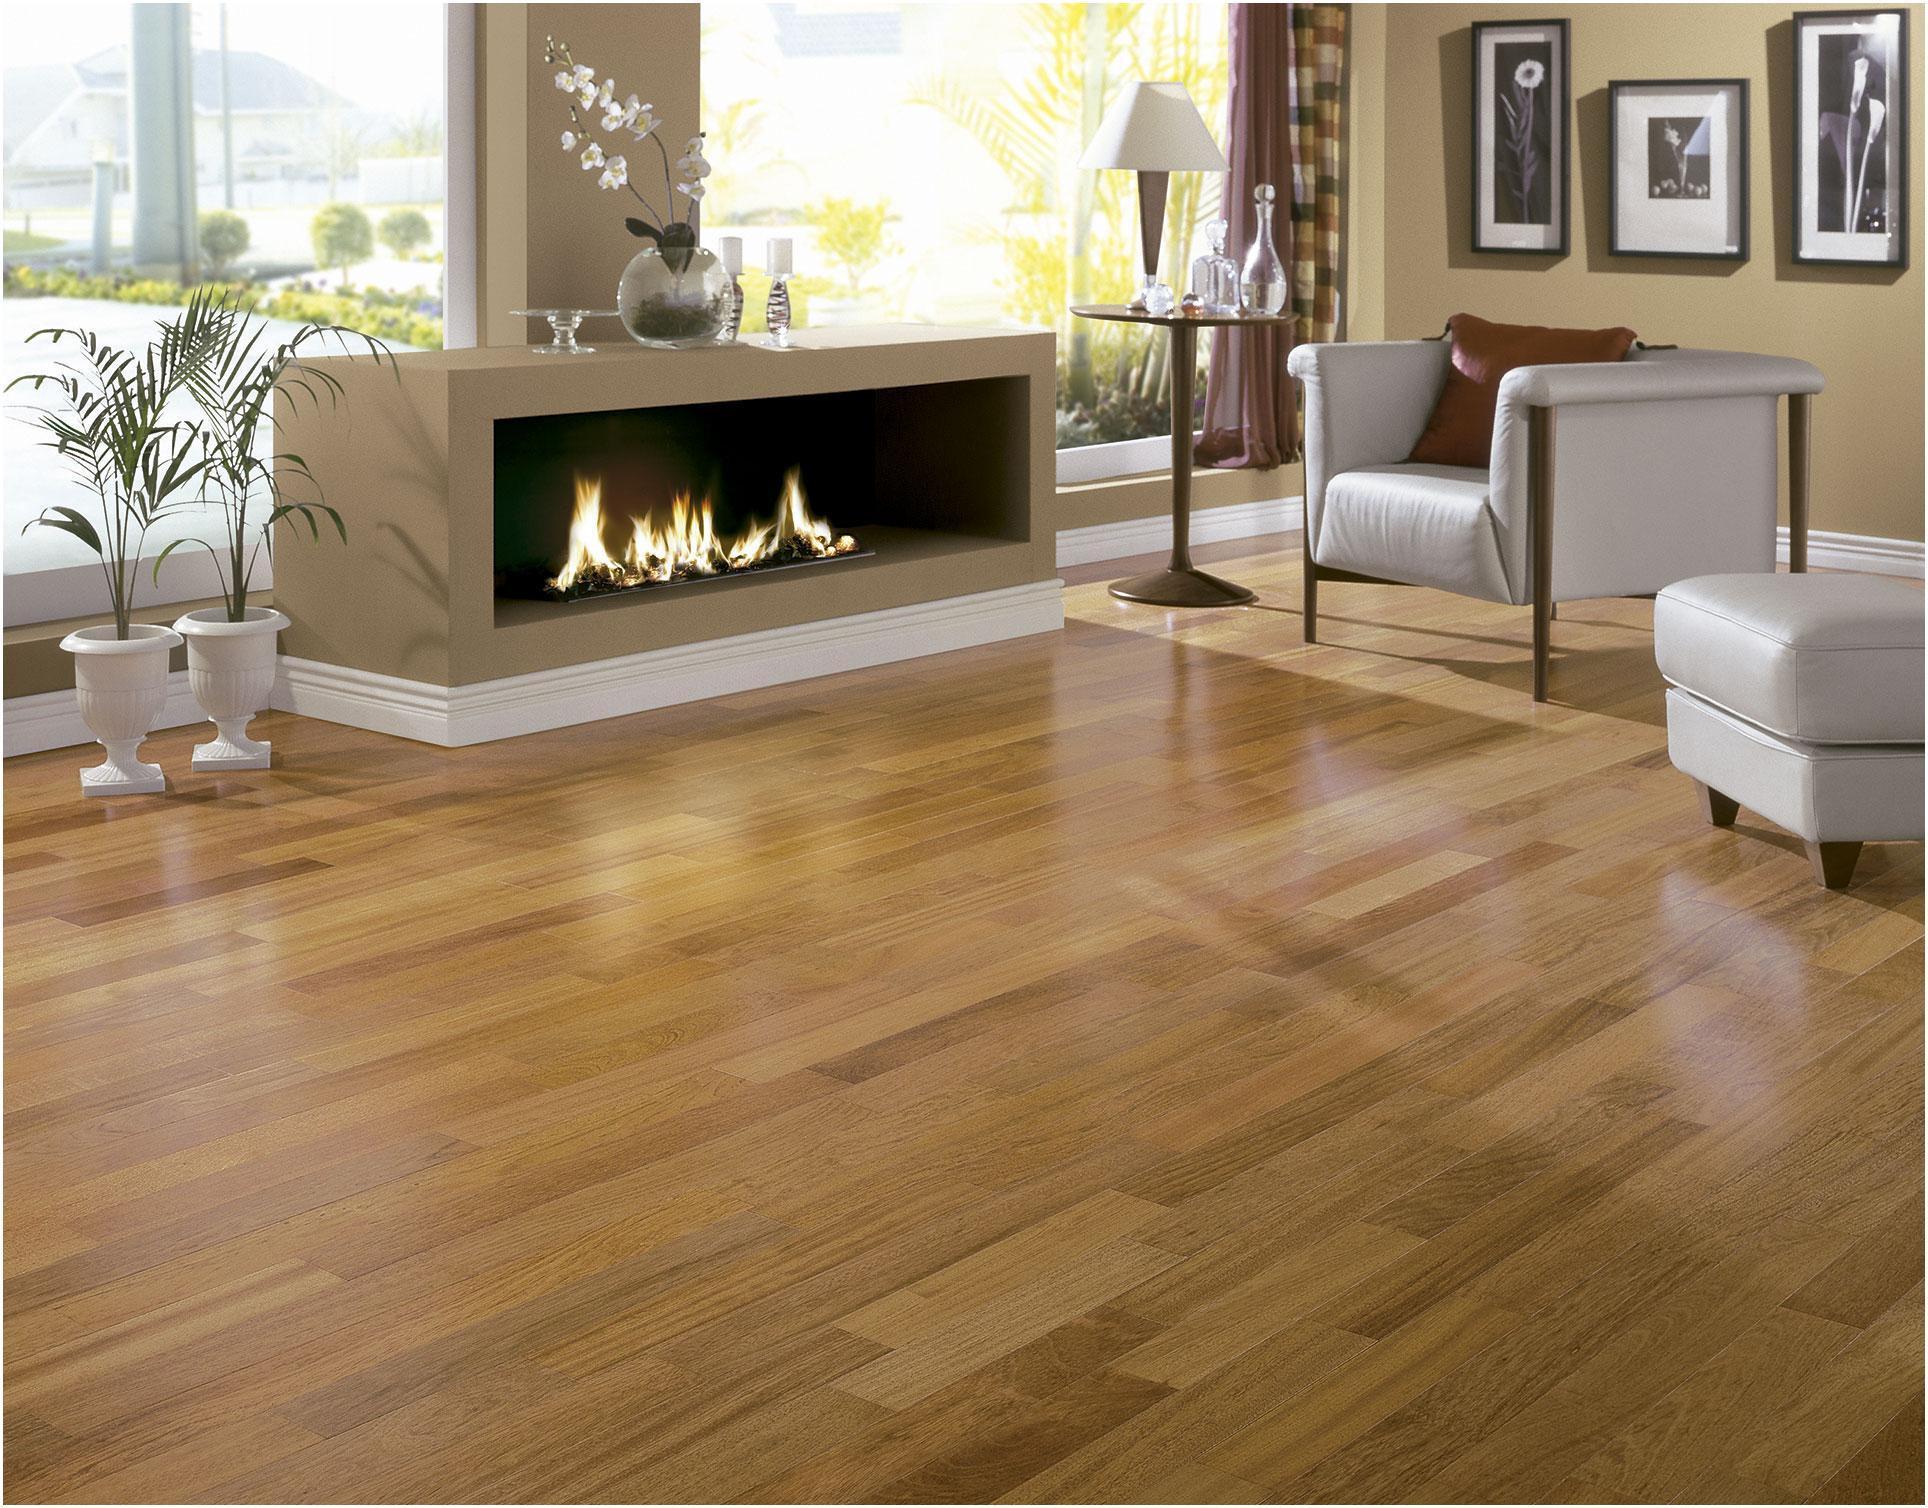 hardwood floor nailer rental of elegant wood floor scrubber concept inside living room fresh hardwood floor colors hardwood floor colors beautiful engaging discount hardwood flooring 5